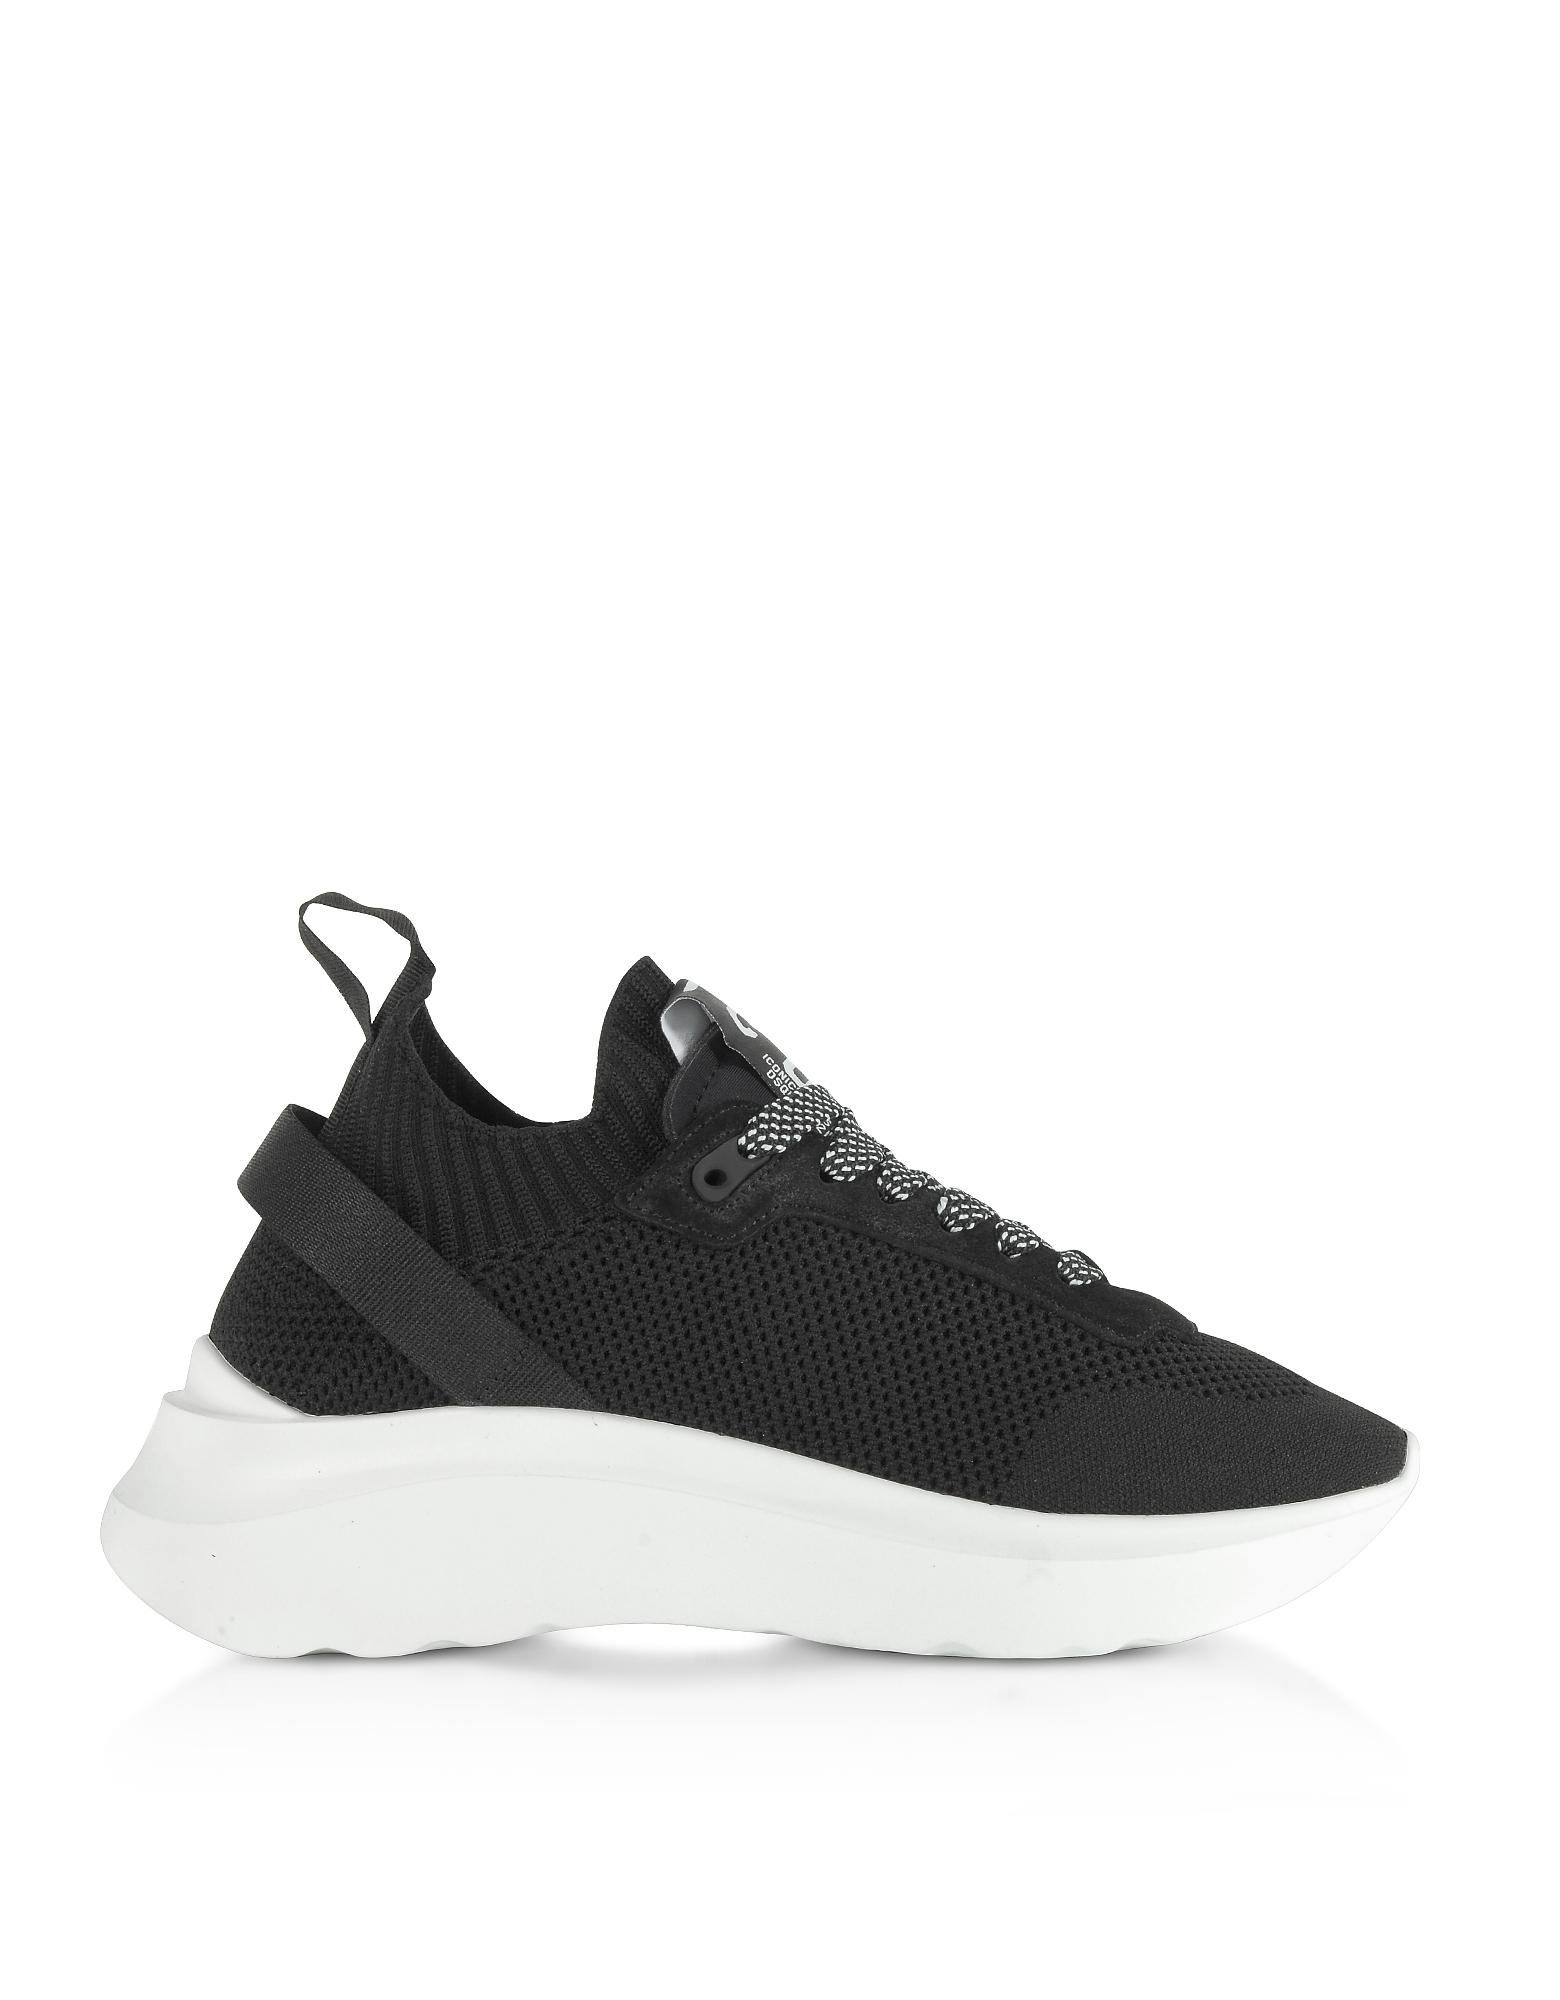 DSquared2 Designer Shoes, Speedster Mesh Women's Sneakers